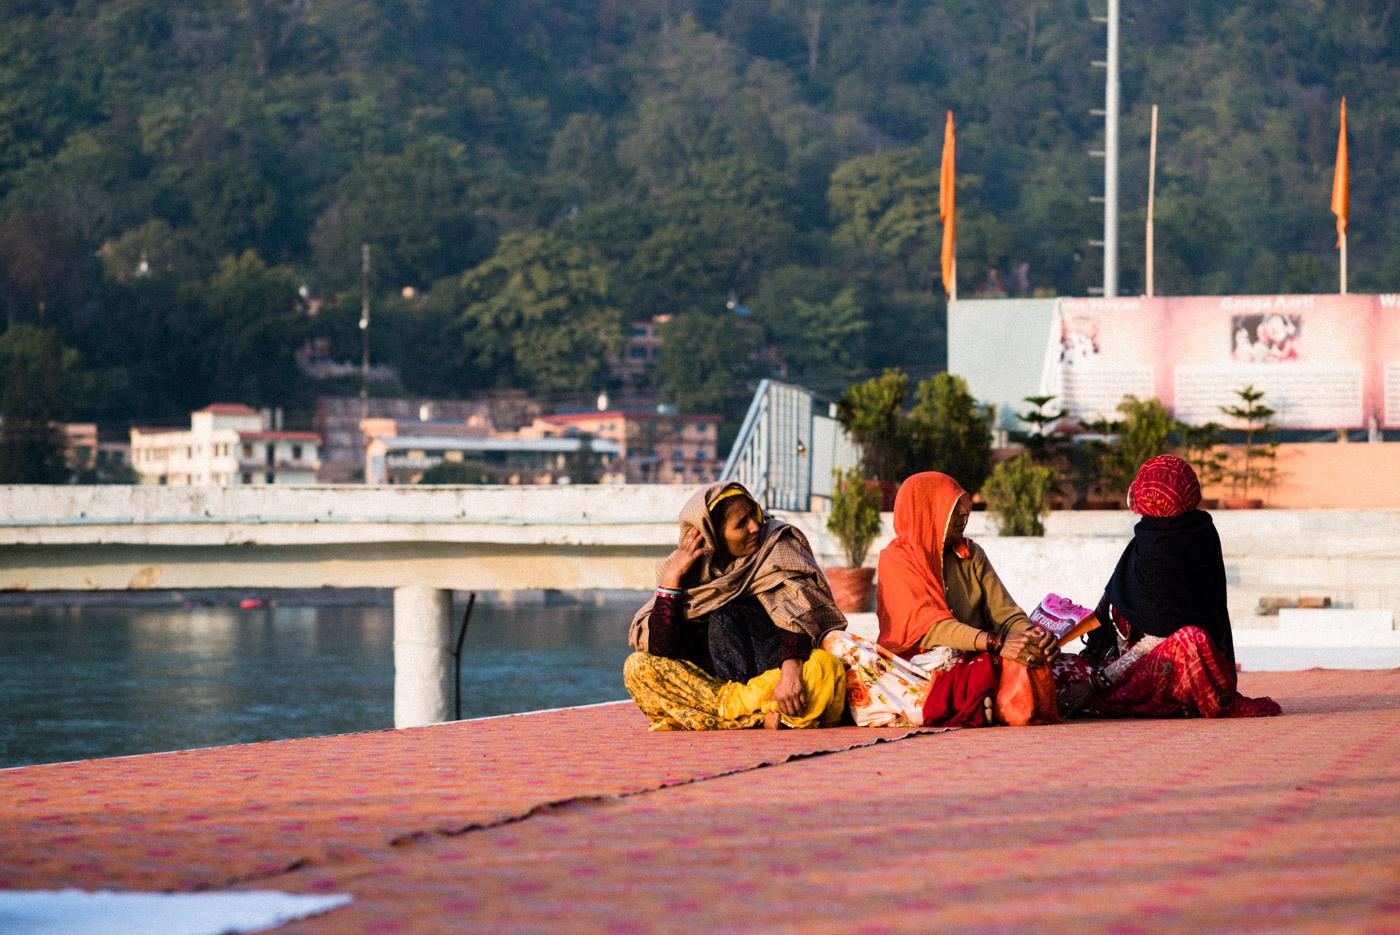 Rishikesh, India - Leica 90mm Summarit f/2.5